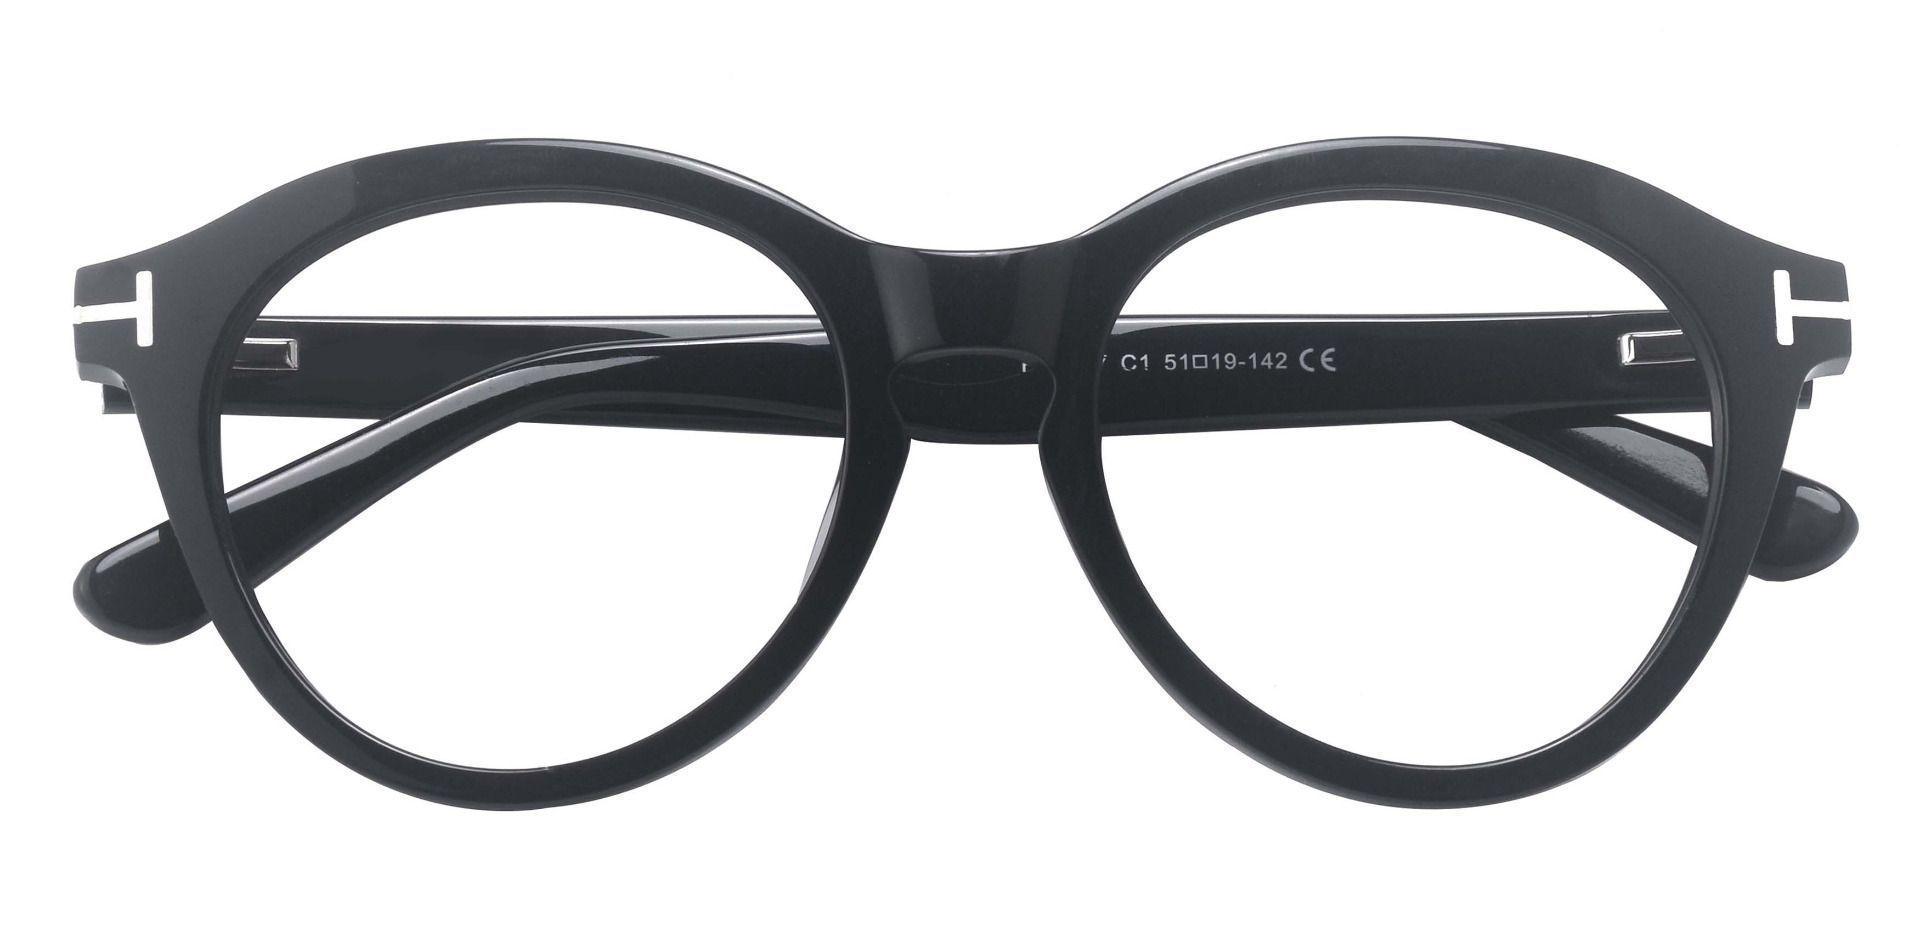 Hayden Round Prescription Glasses - Black